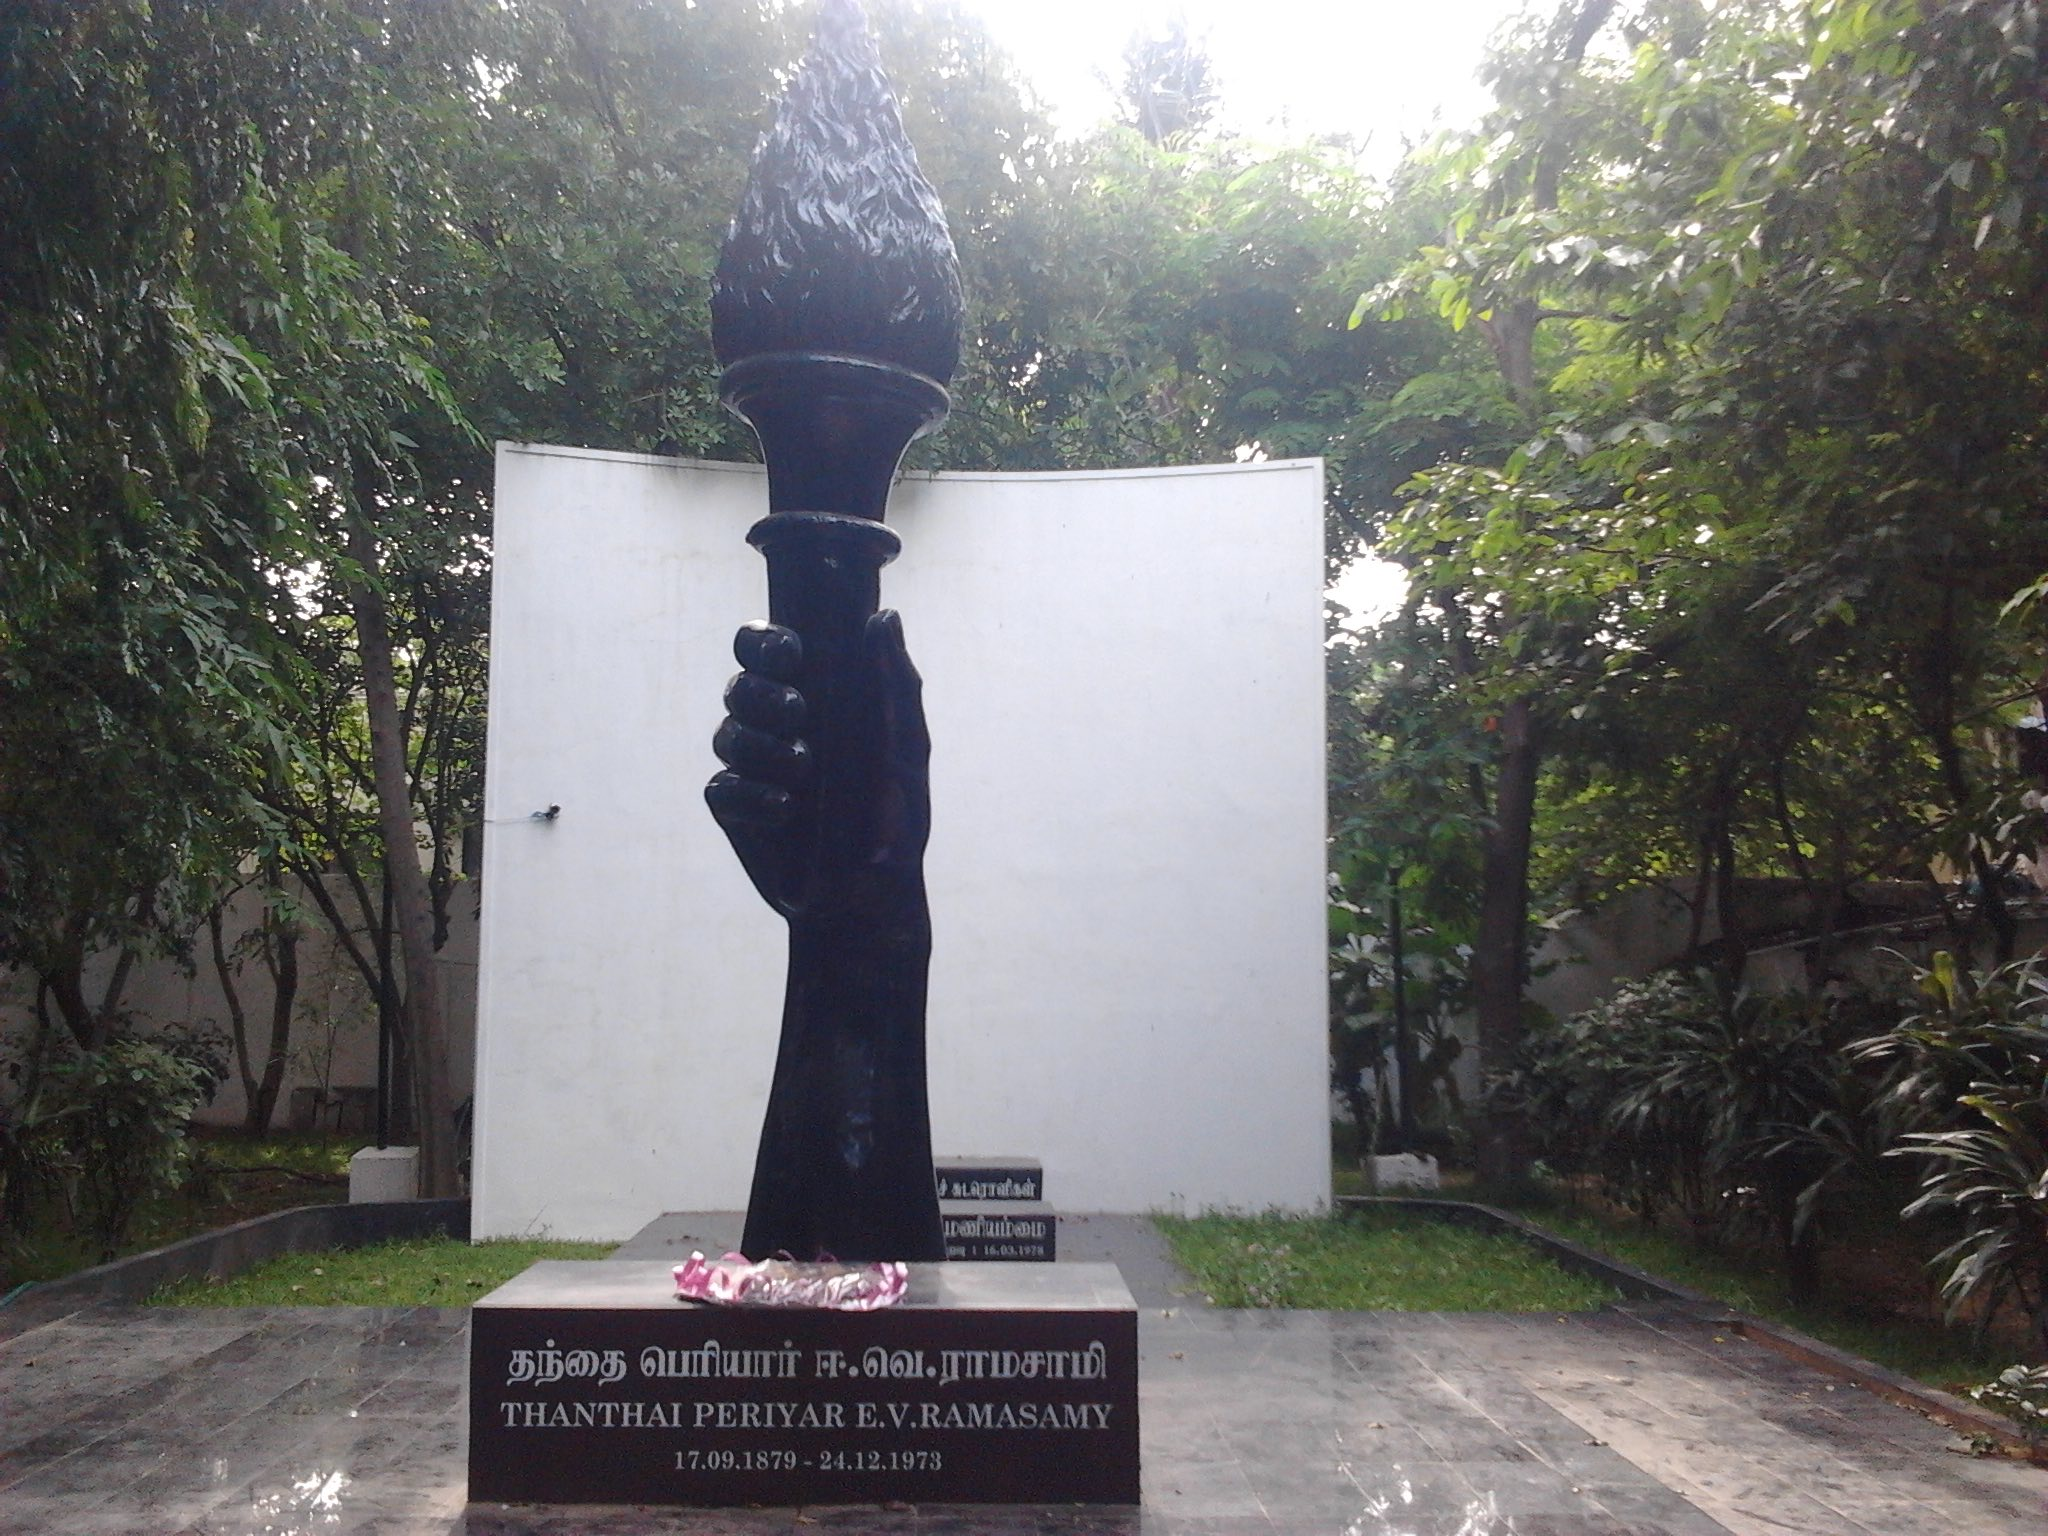 The Periyar memorial in Chennai. Credit: Wikimedia Commons